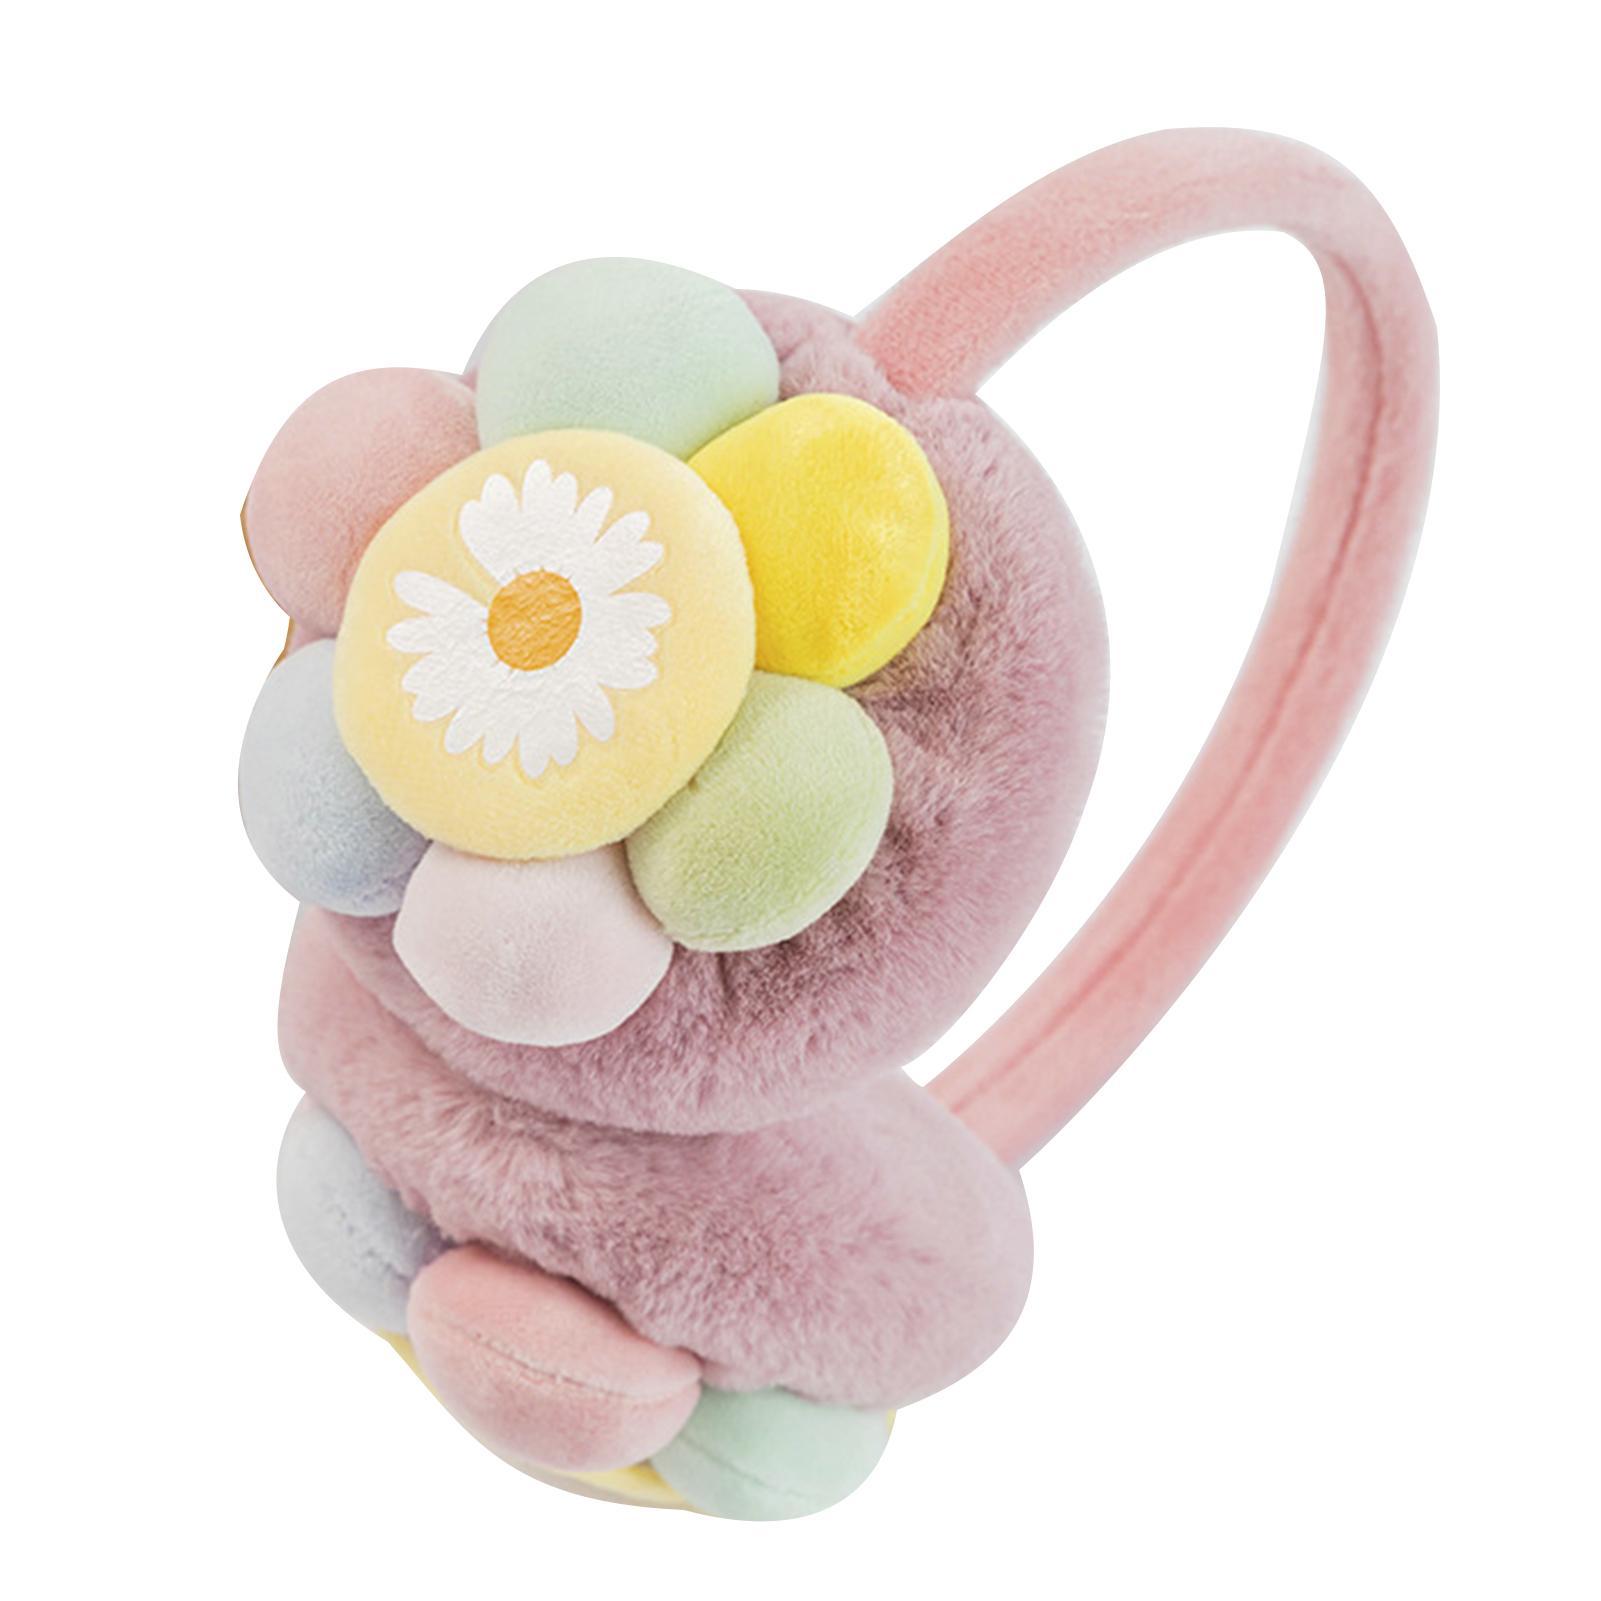 Outdoor Winter Earmuffs Kids Cute Flower Sunflower Plush Earmuff Boys Girls Ear Warmer Ear Cover Protector Riding Ear Muffs